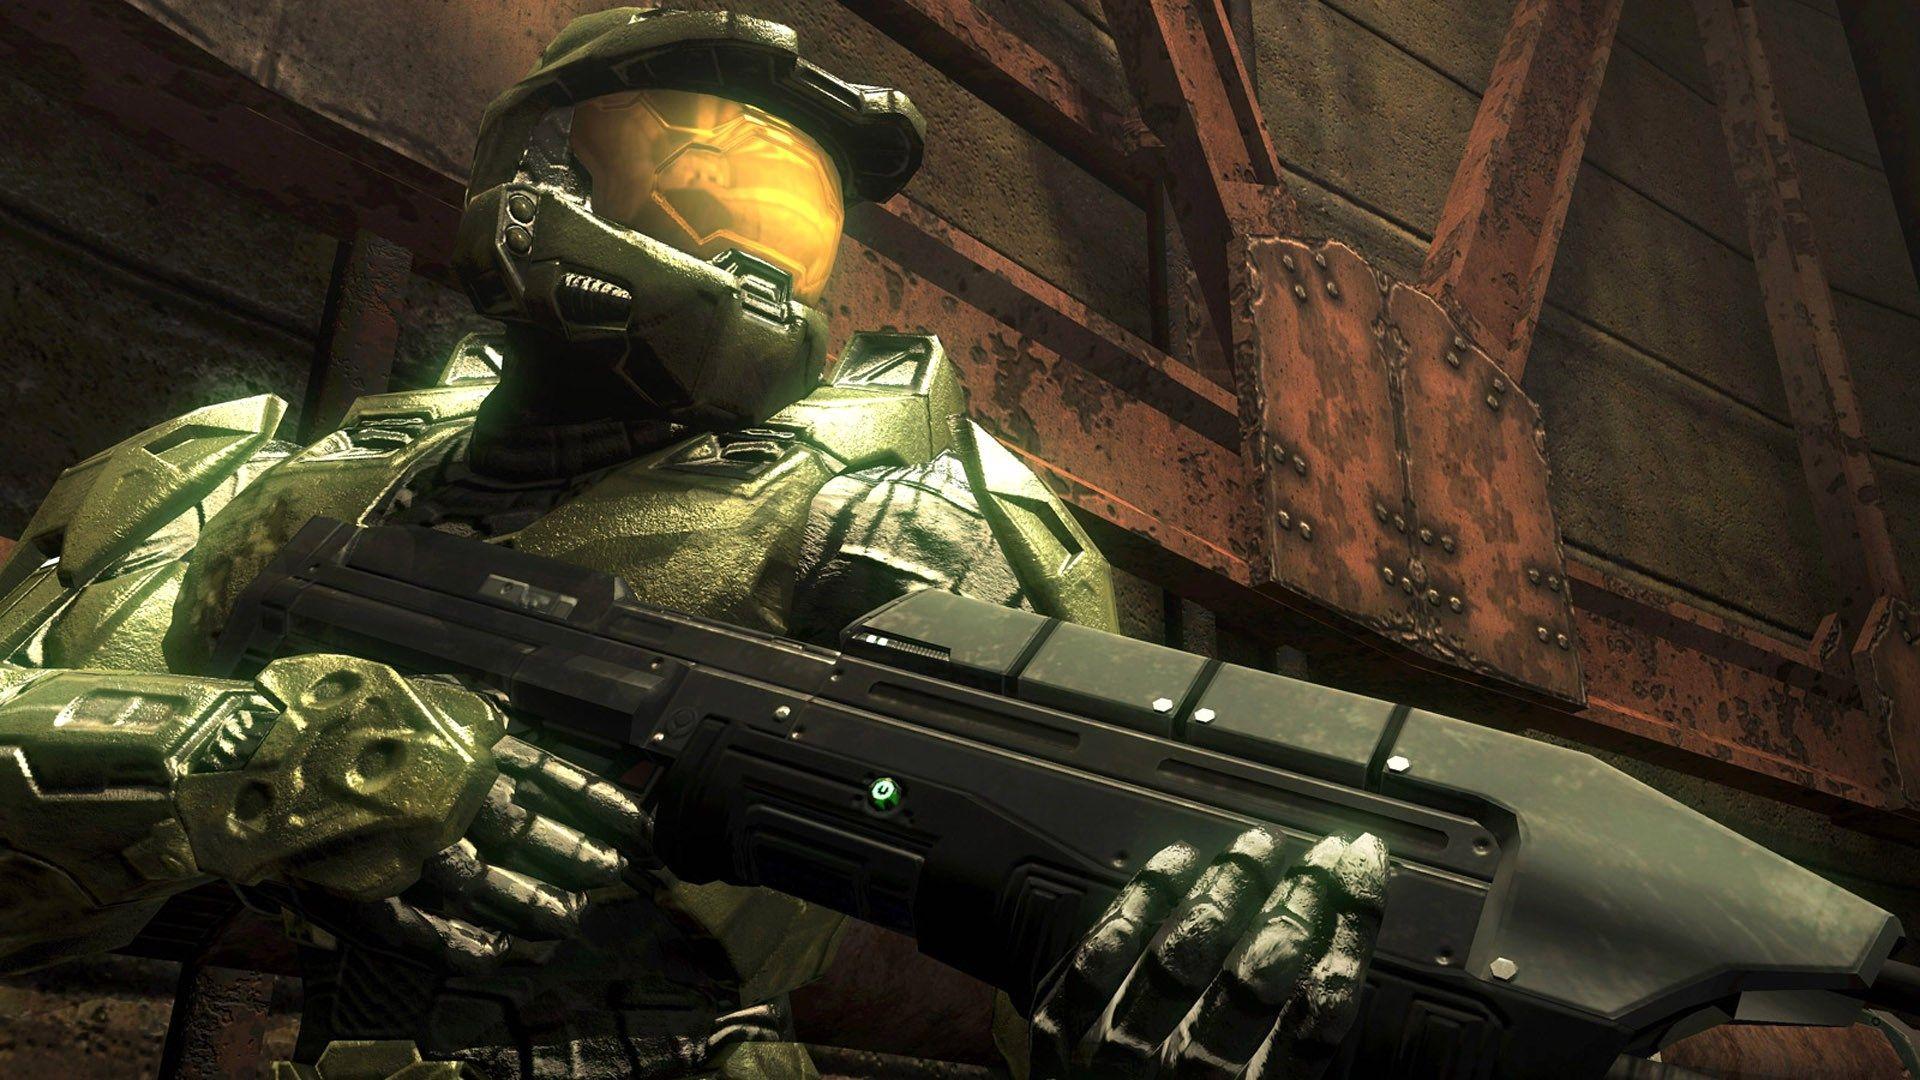 Wallpaper Desktop Halo Combat Evolved 417 Kb Branton Birds